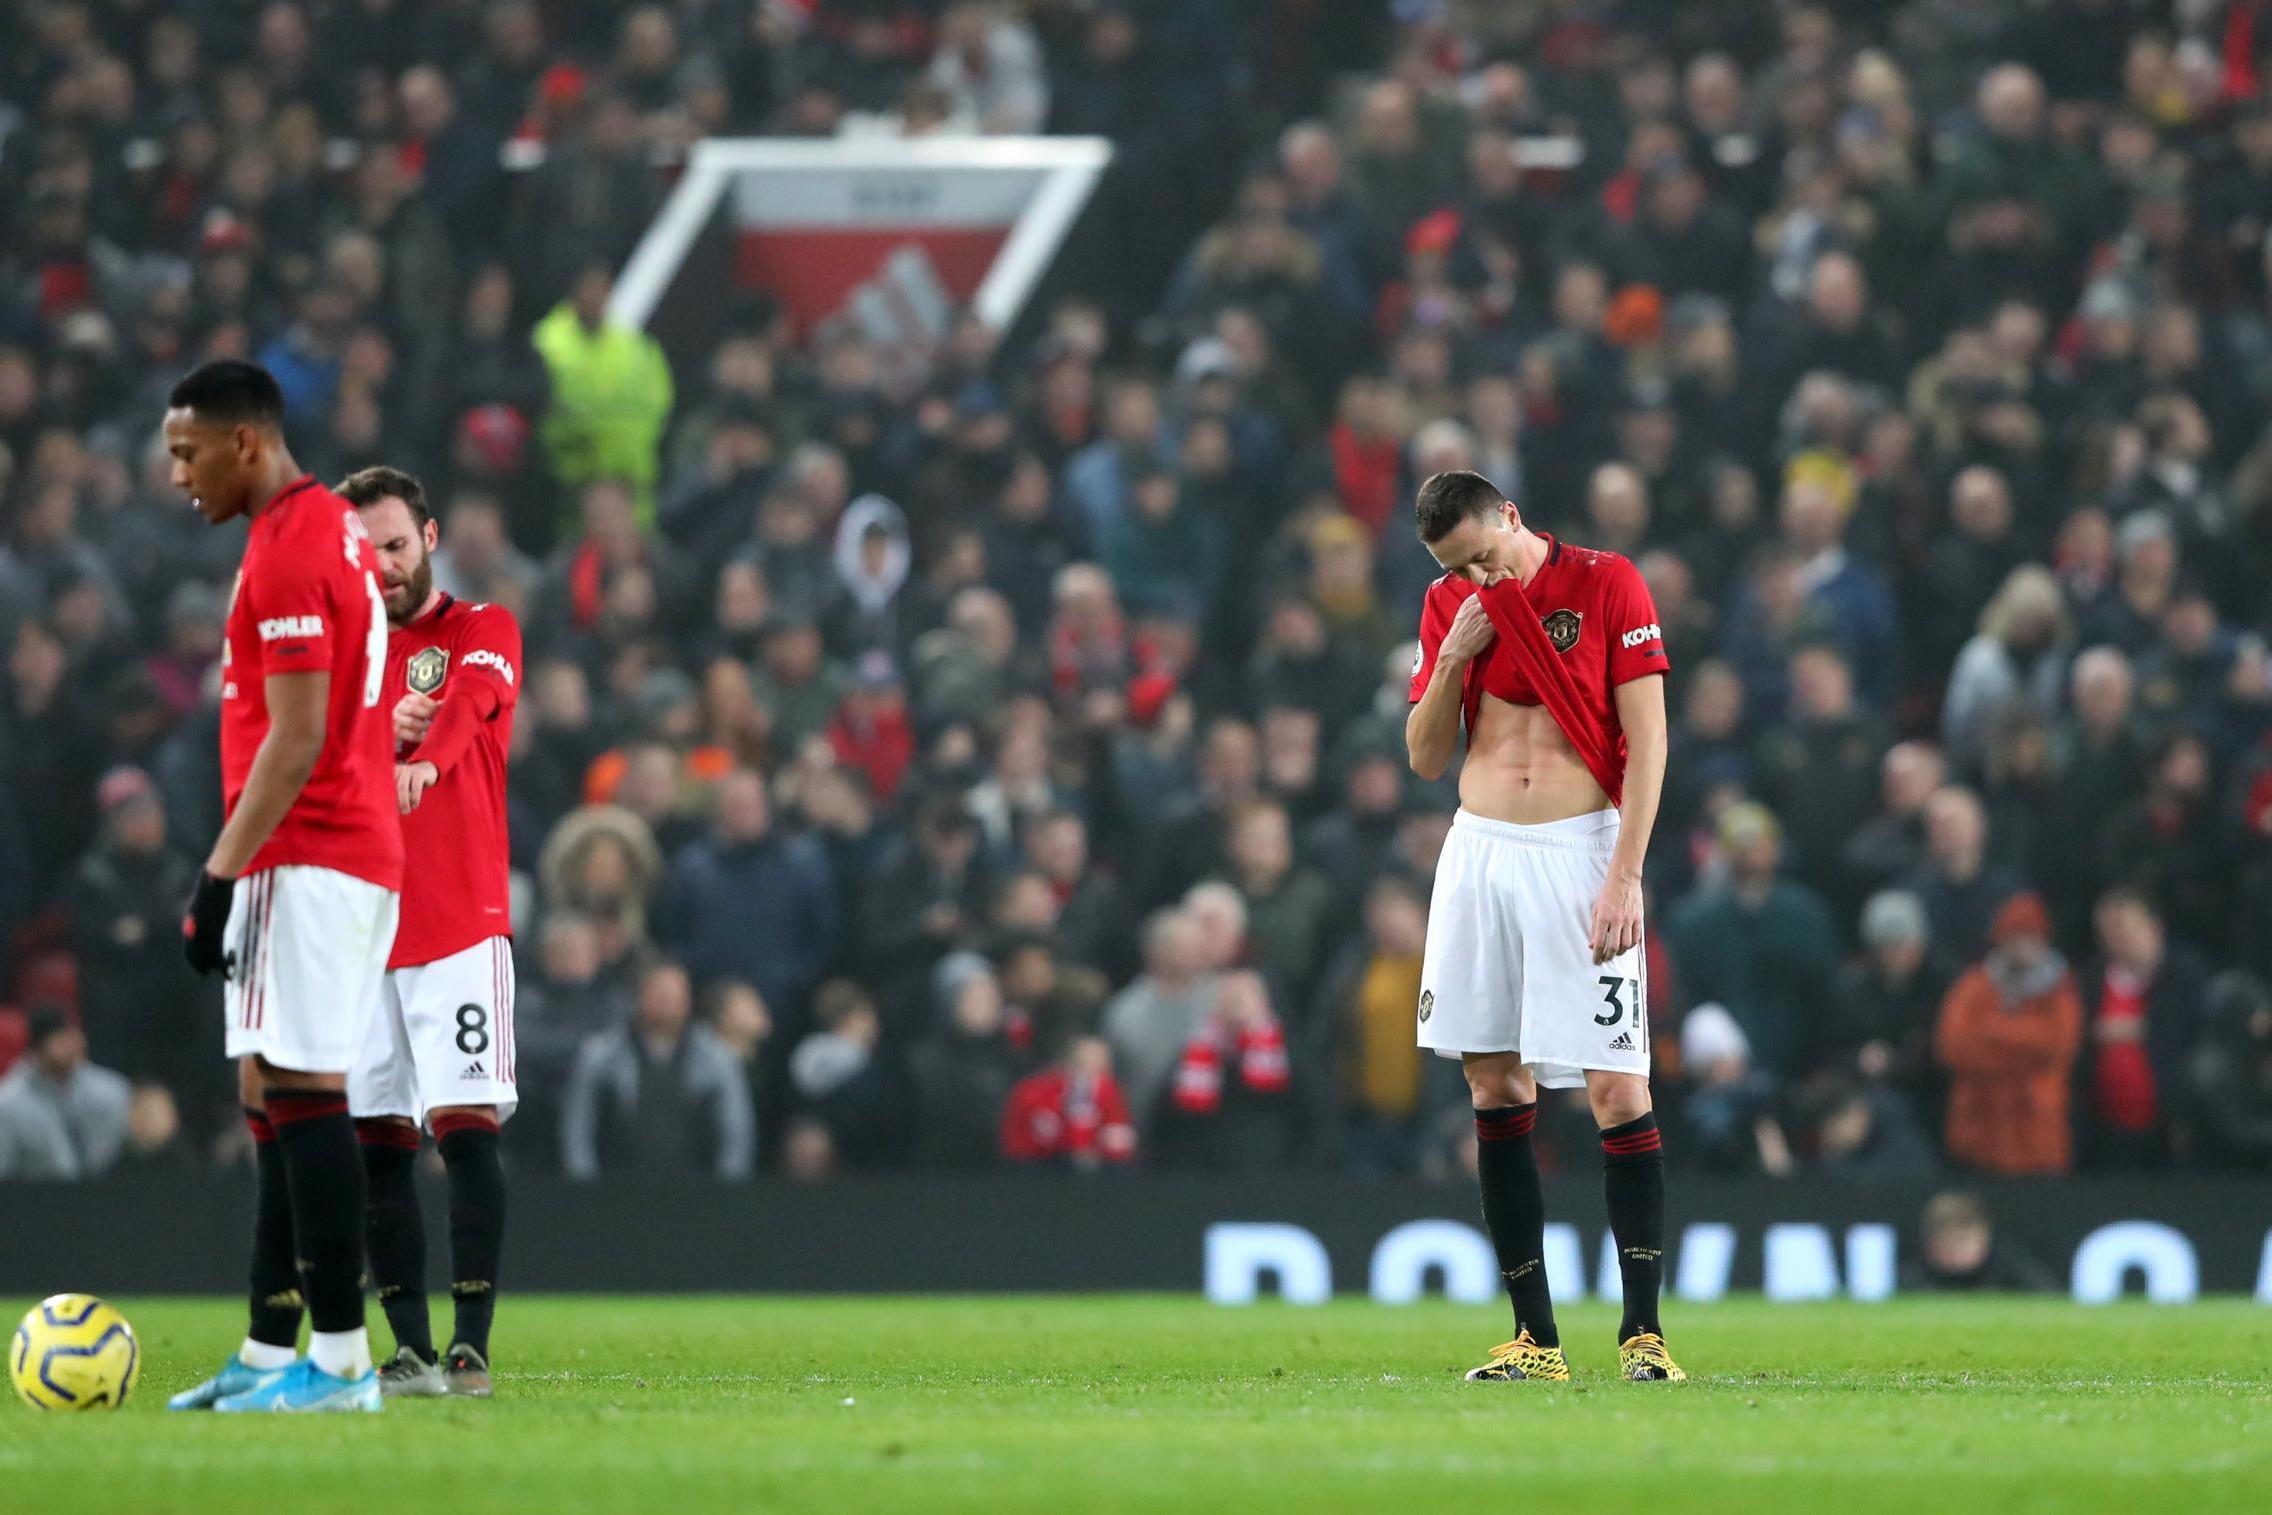 Match Report: Manchester United vs Burnley